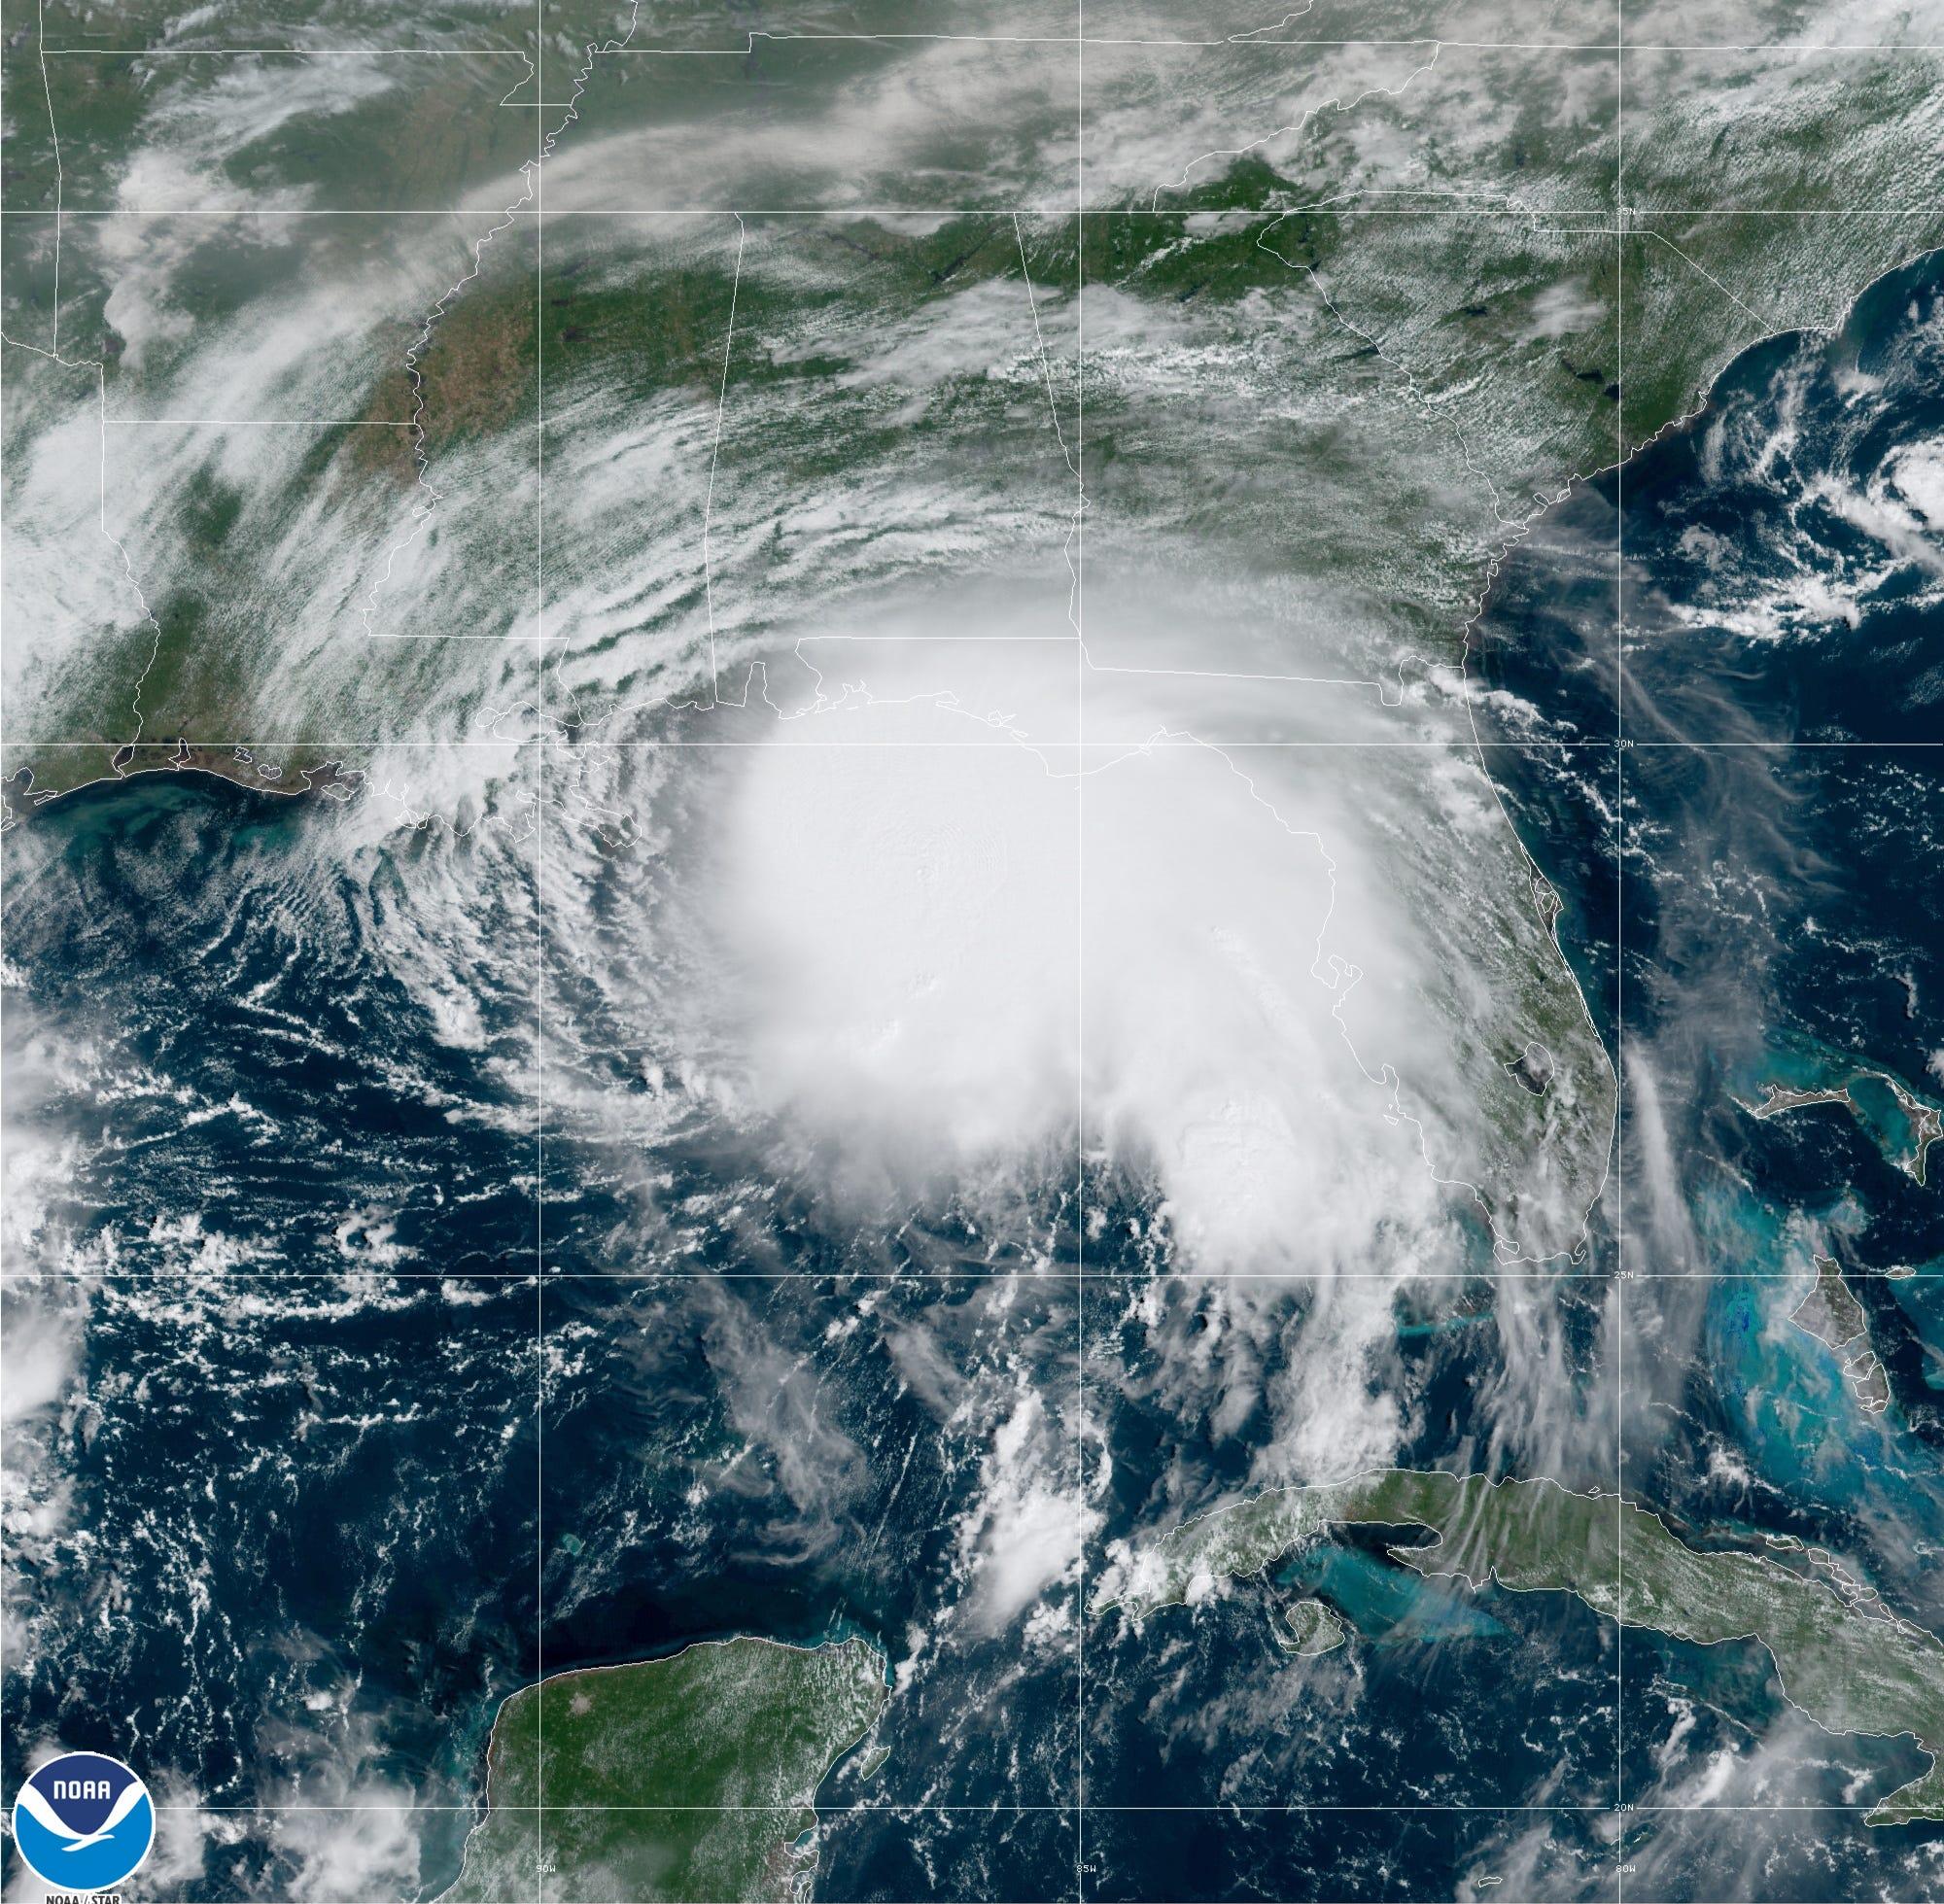 Still reeling from Hurricane Laura, Gulf Coast braces for Hurricane Sally